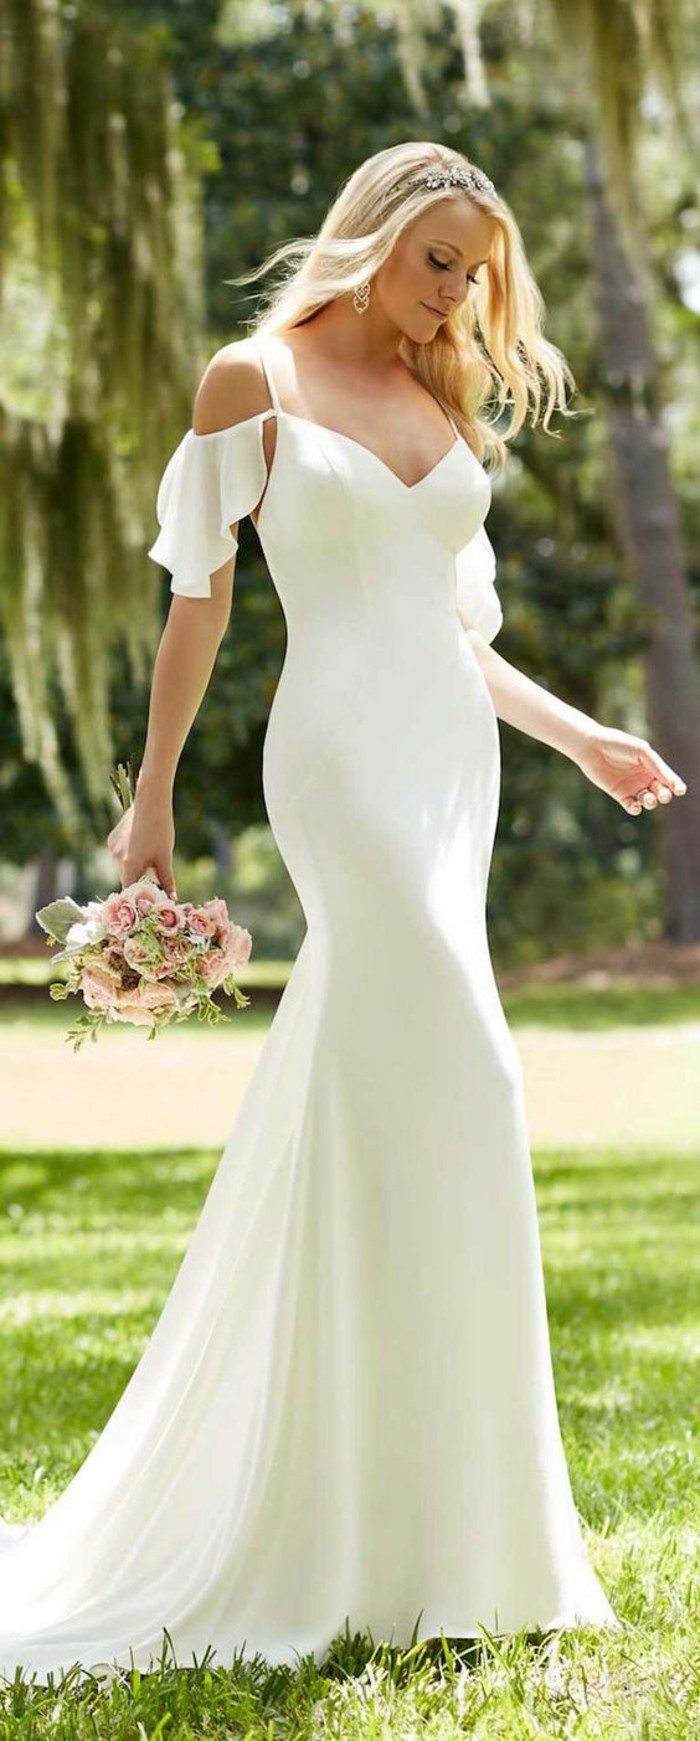 adorable-robe-mariee-simple-et-elegante-manches-feeriques